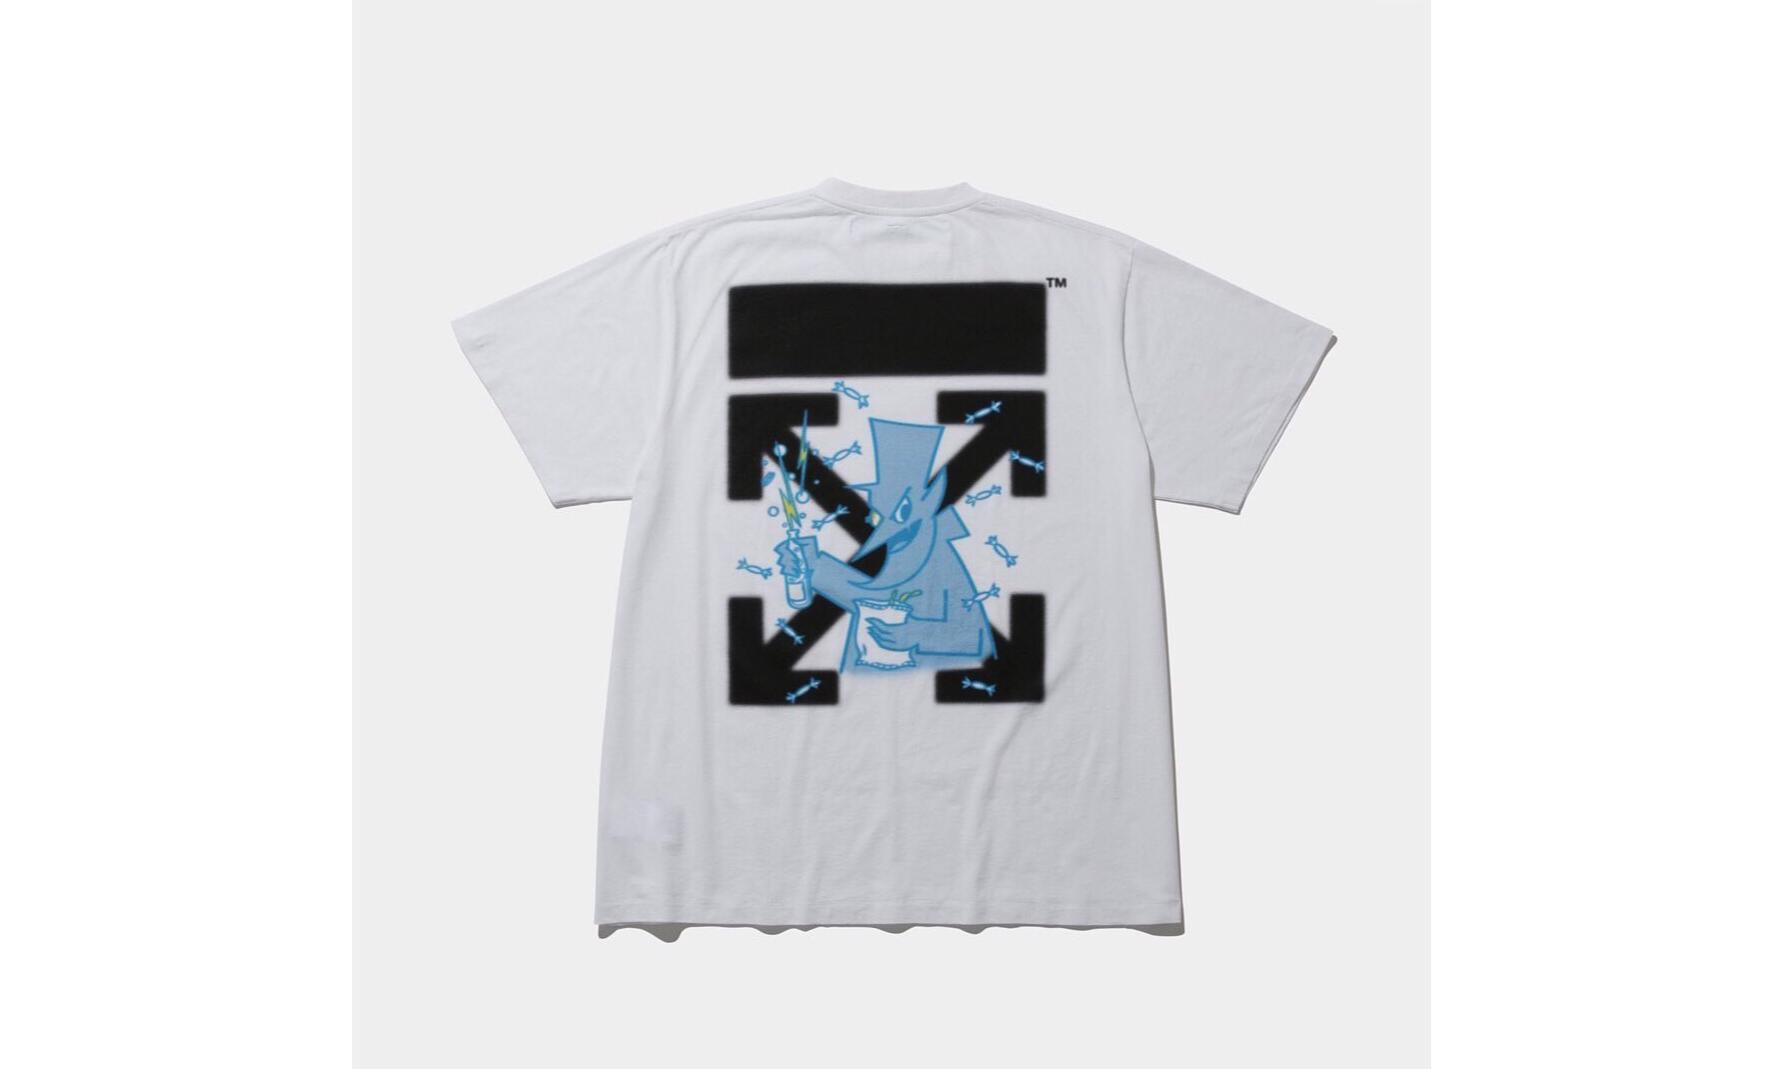 Fragment x Off-White™ 全新 T 恤即将登陆 The Conveni 发售